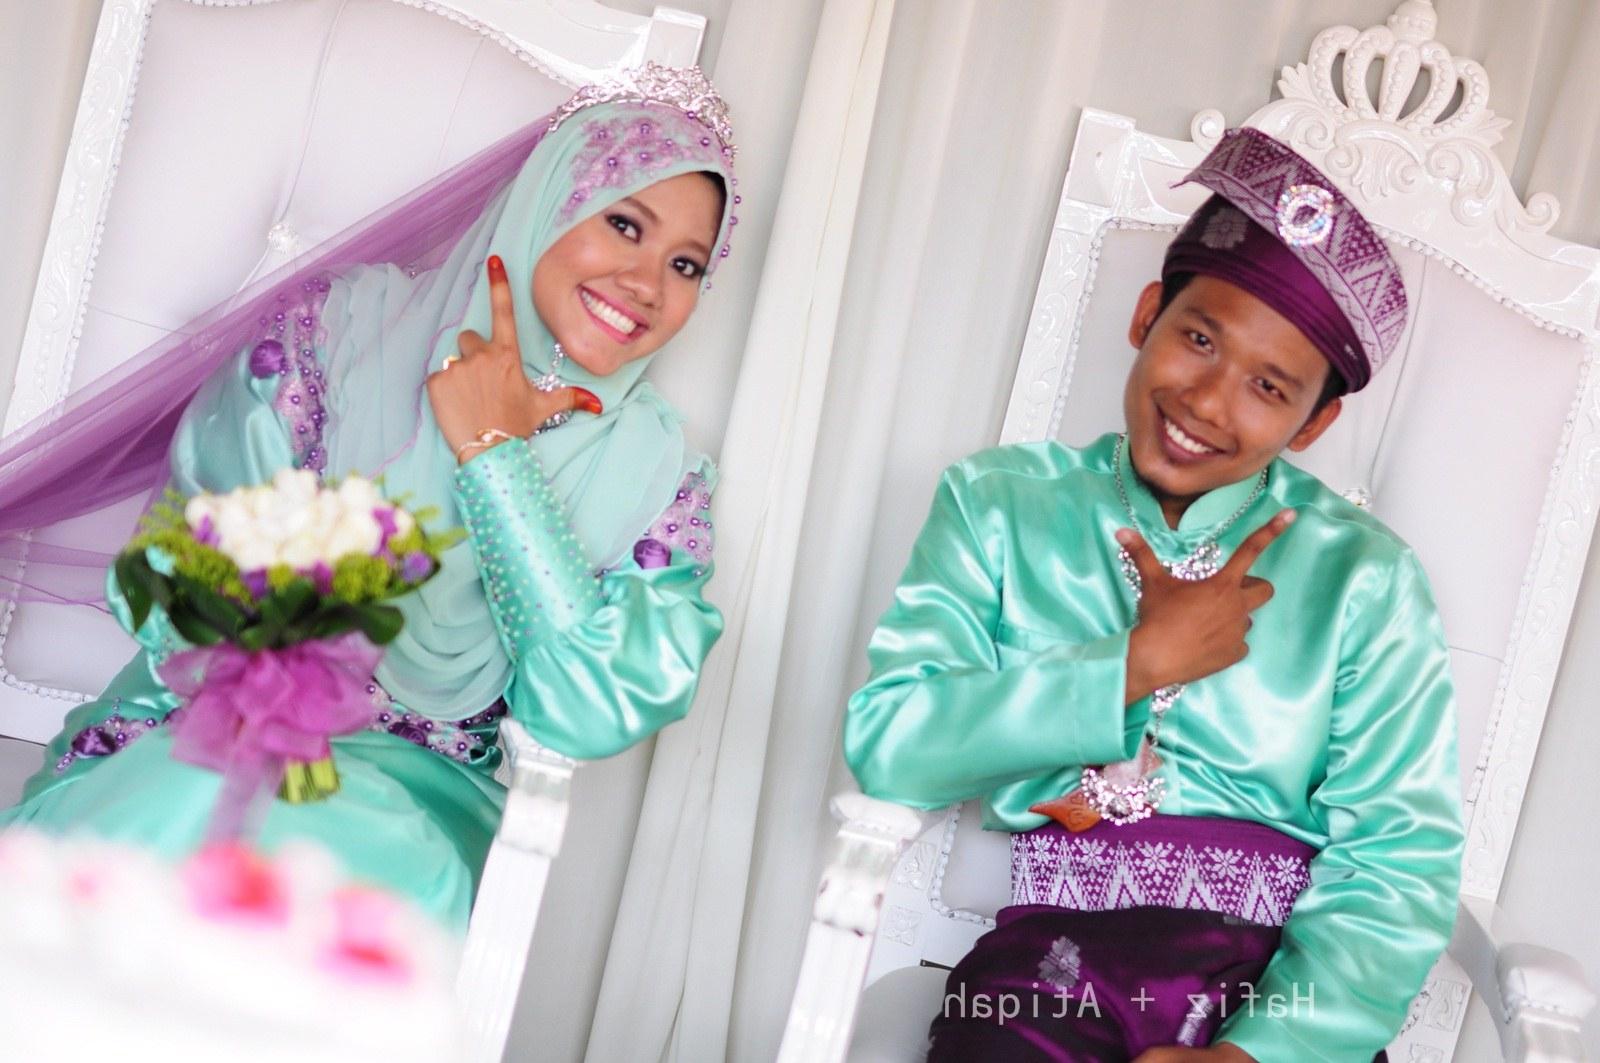 Bentuk Gambar Baju Pengantin Muslim 4pde 36 Baju Pengantin songket Mint Green Modis Dan Cantik